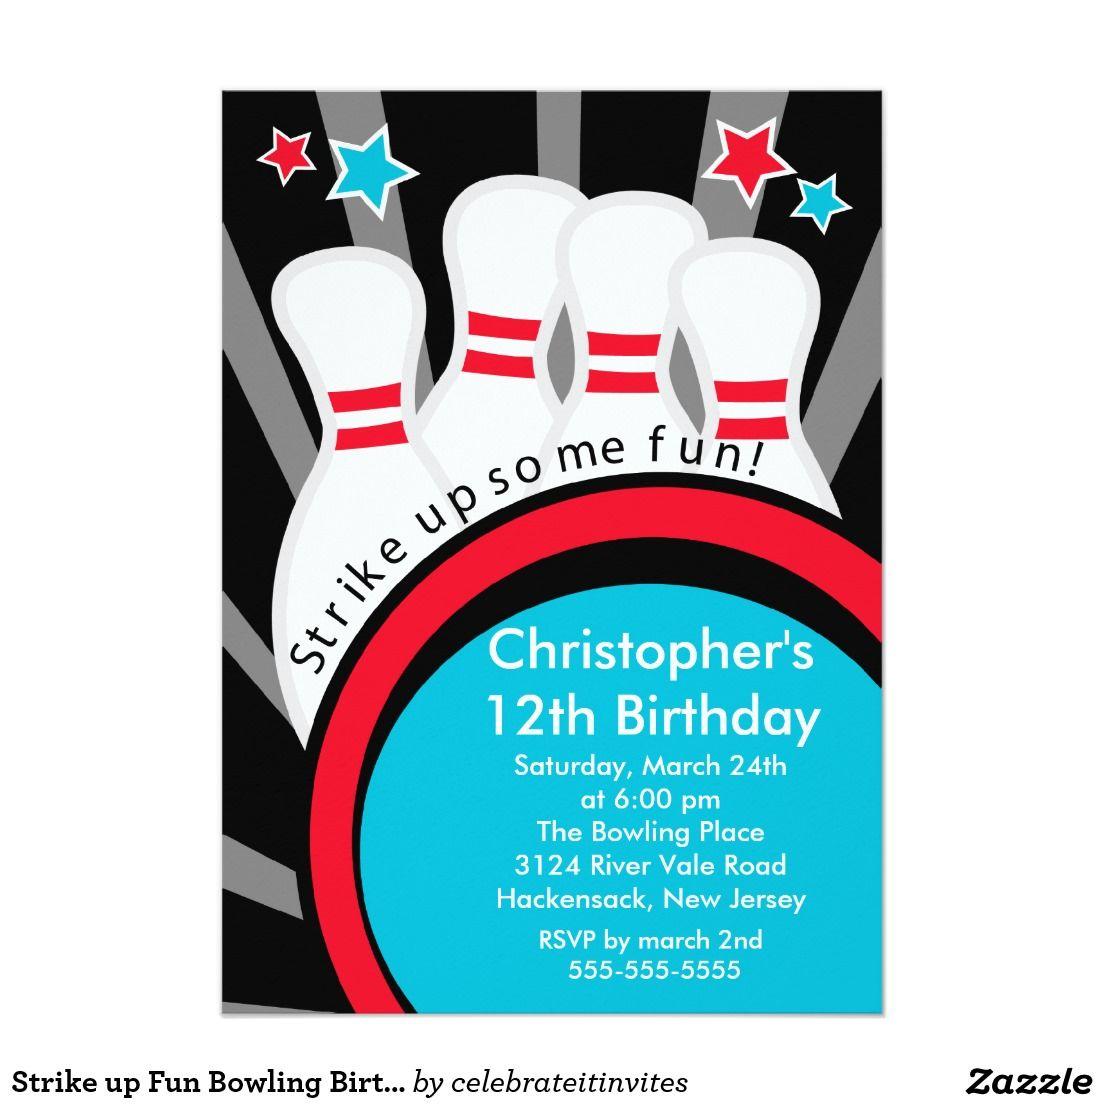 Strike Up Fun Bowling Birthday Party Invitation  Birthday Party